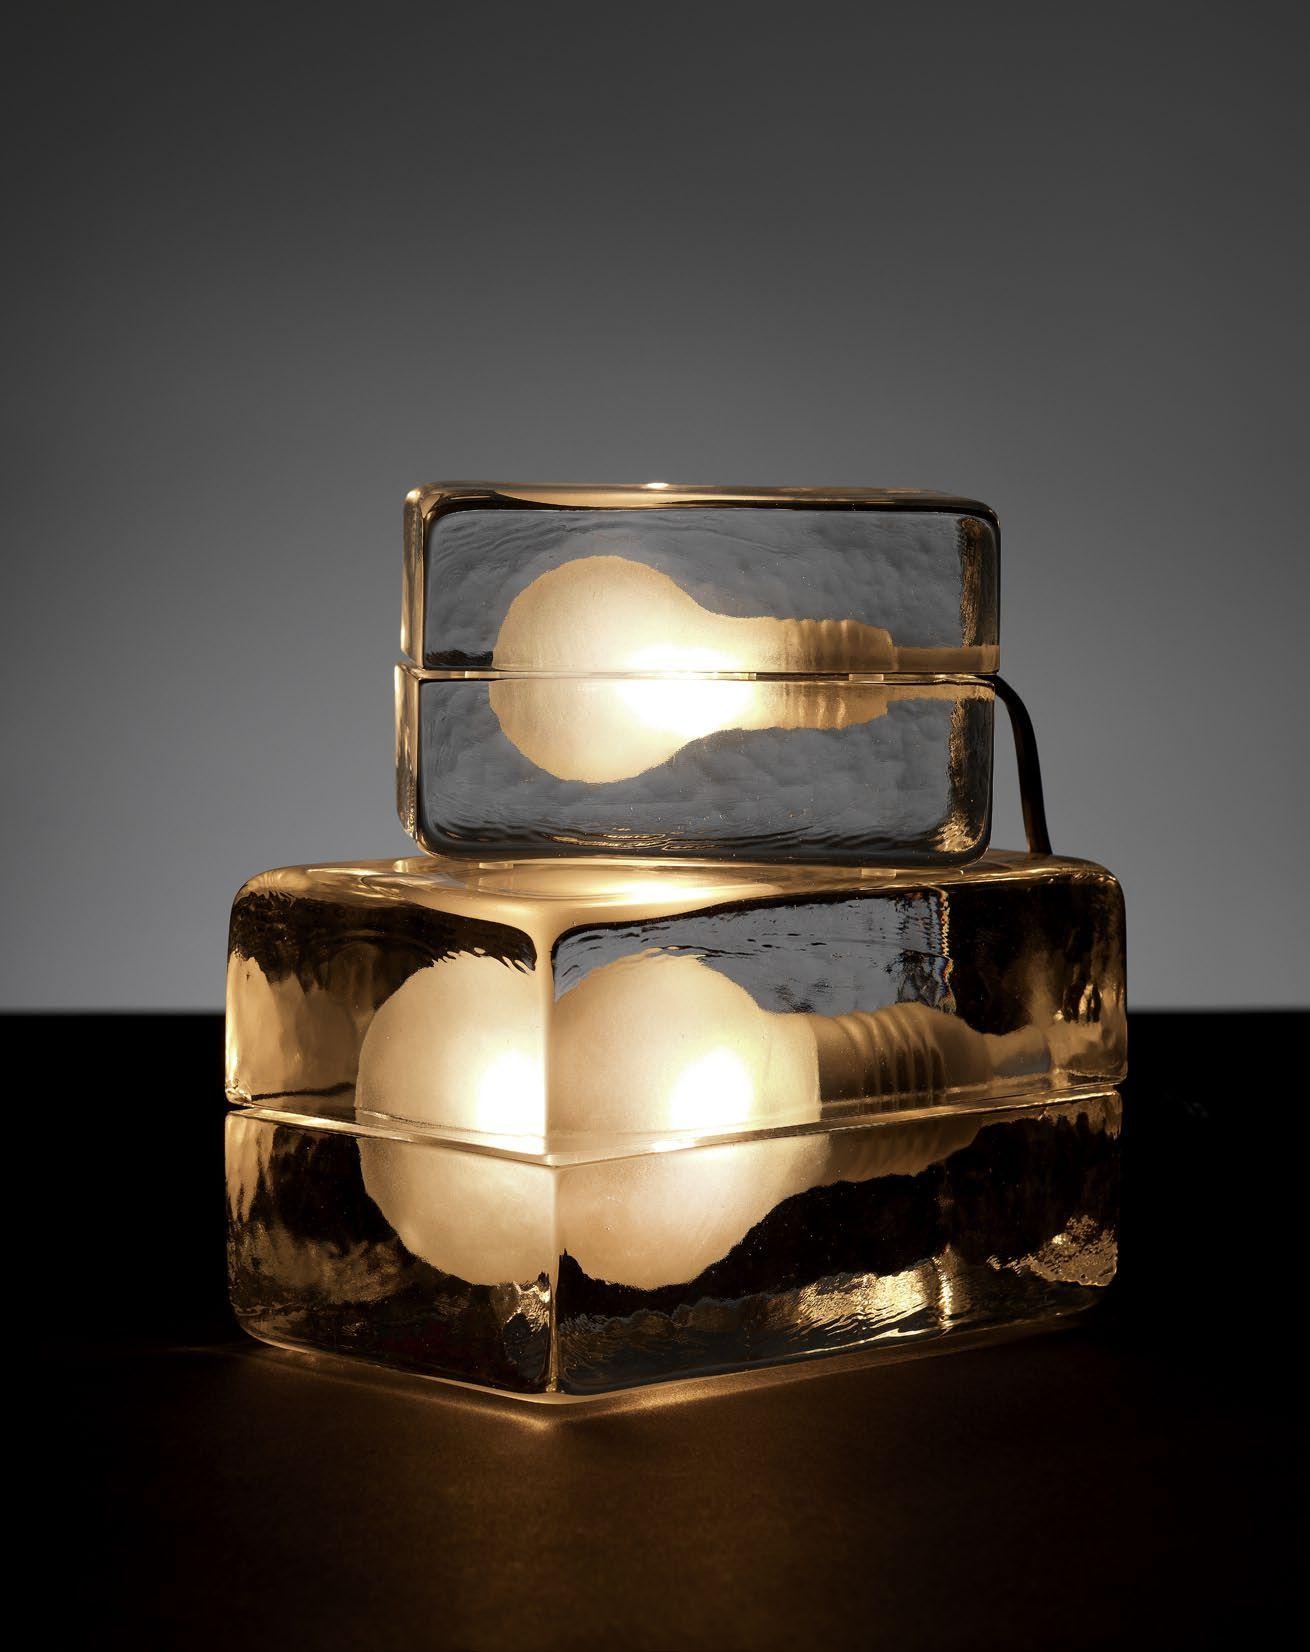 12cm new modern contemporary stylish ice cube table lamp desk light 12cm new modern contemporary stylish ice cube table lamp desk light fixture x1 aloadofball Choice Image